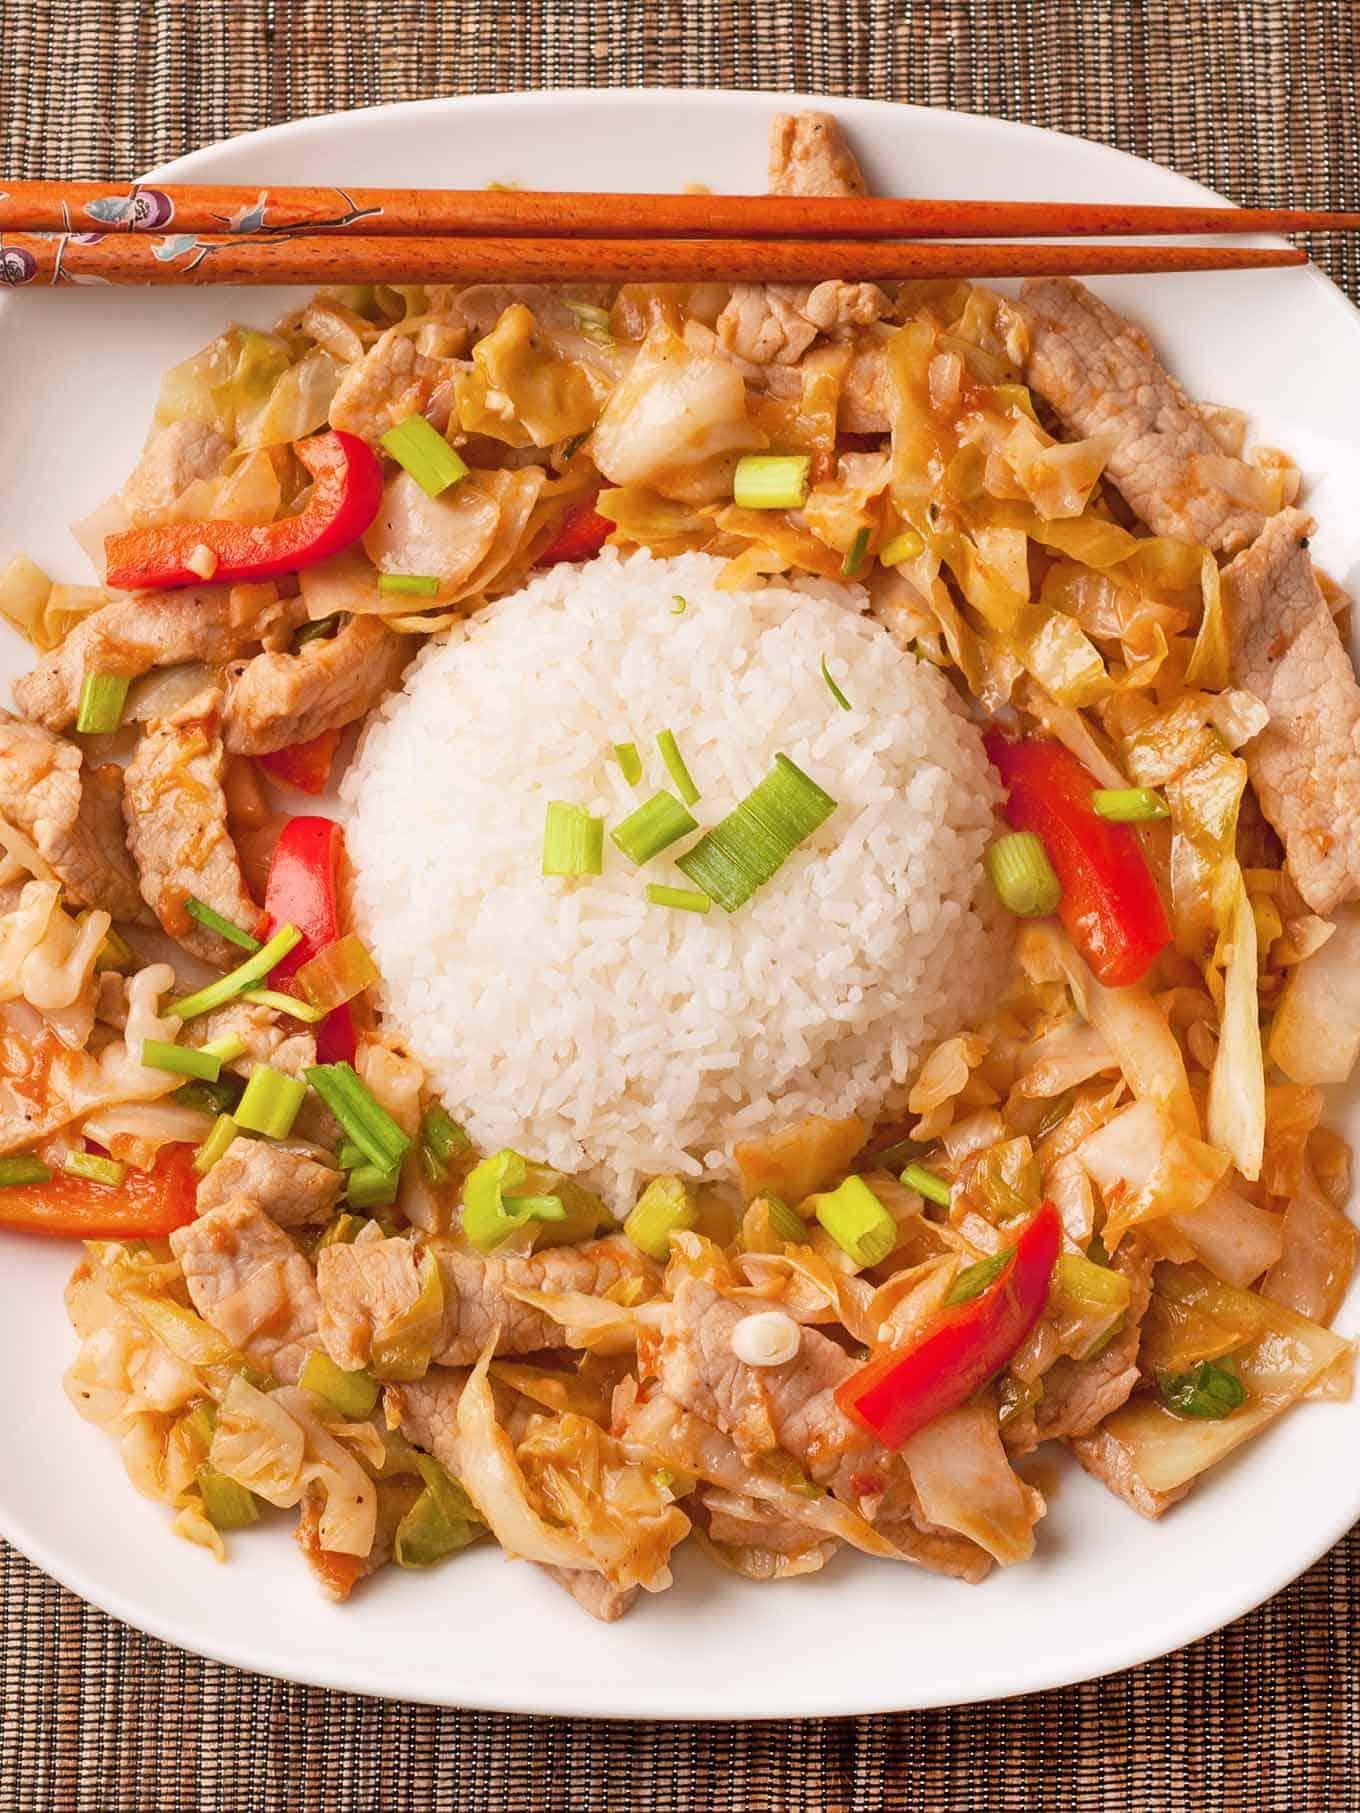 Spicy Stir-Fried Pork With Cabbage